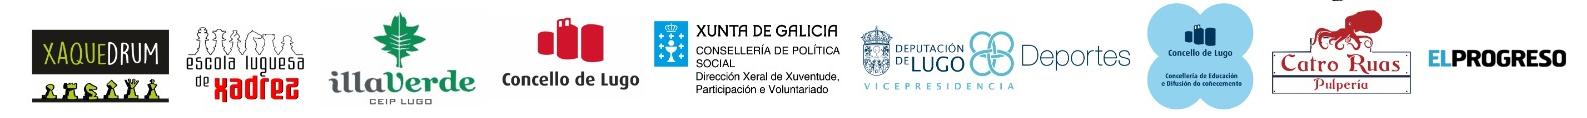 Campas de Xadrez Lugo 2020